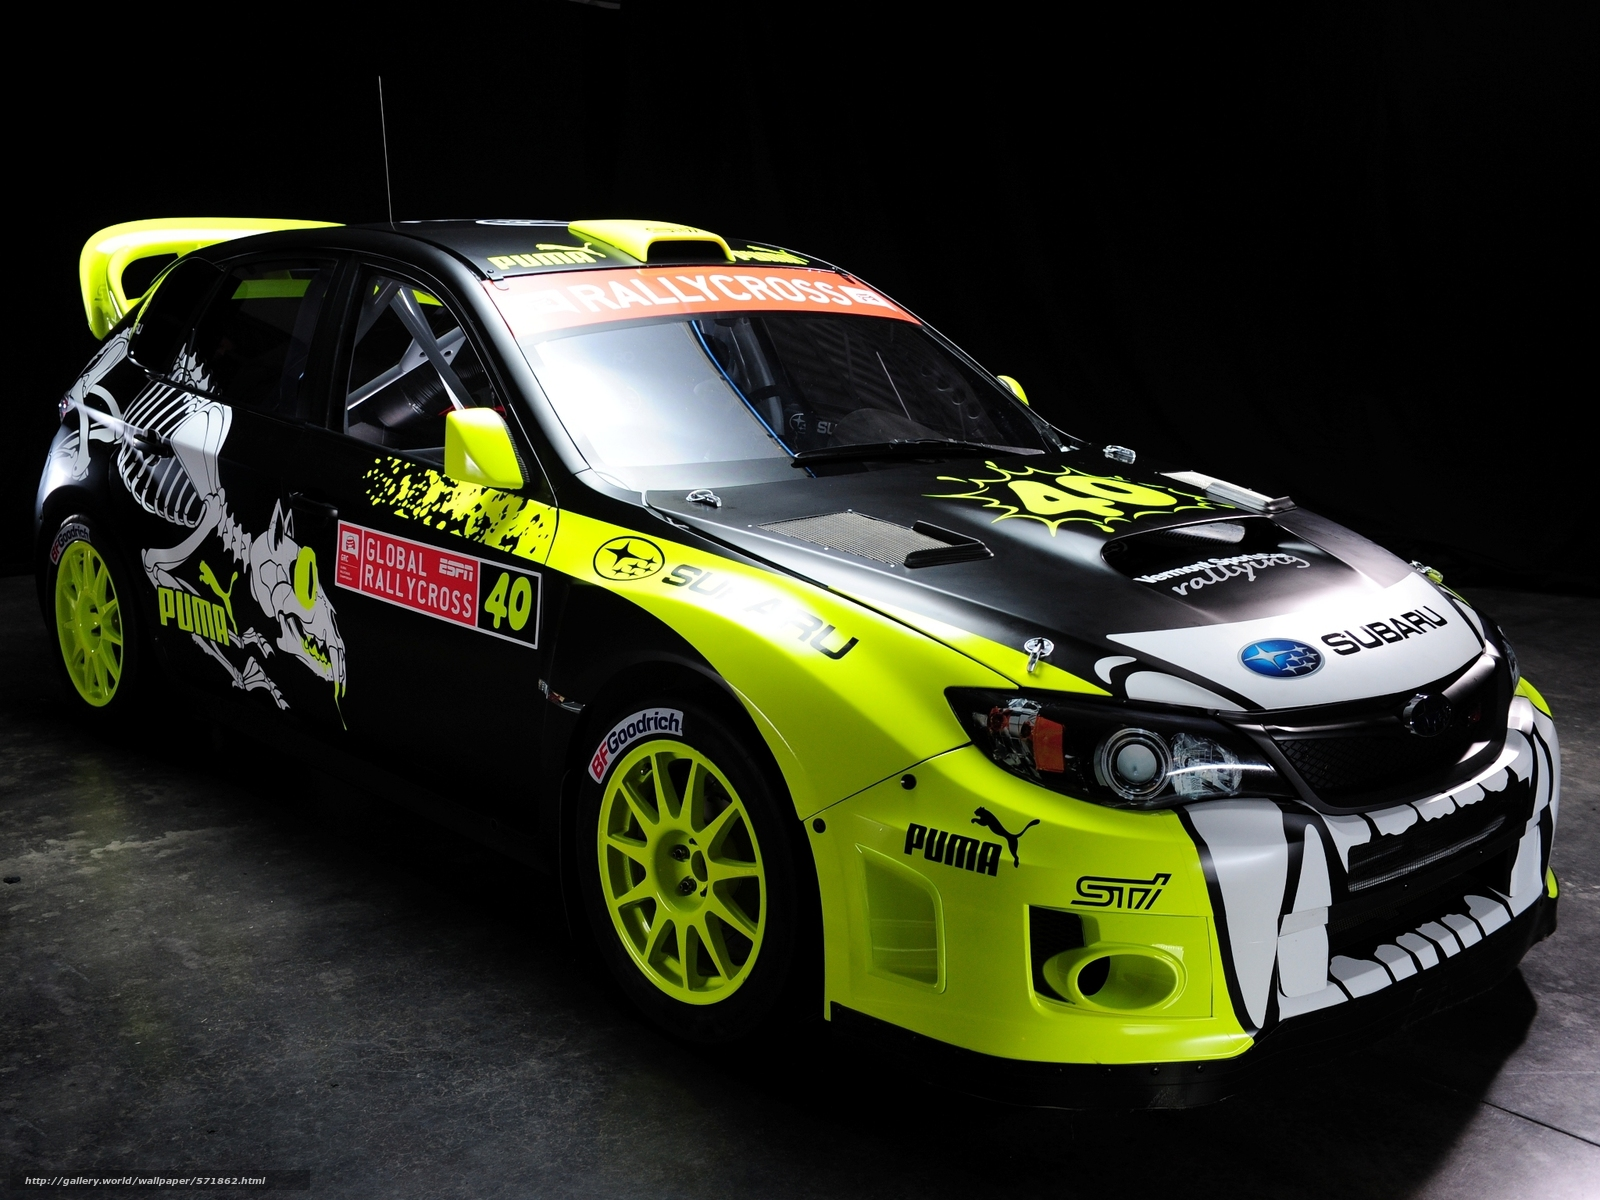 Tlcharger Fond D Ecran Voiture Subaru Rassemblement